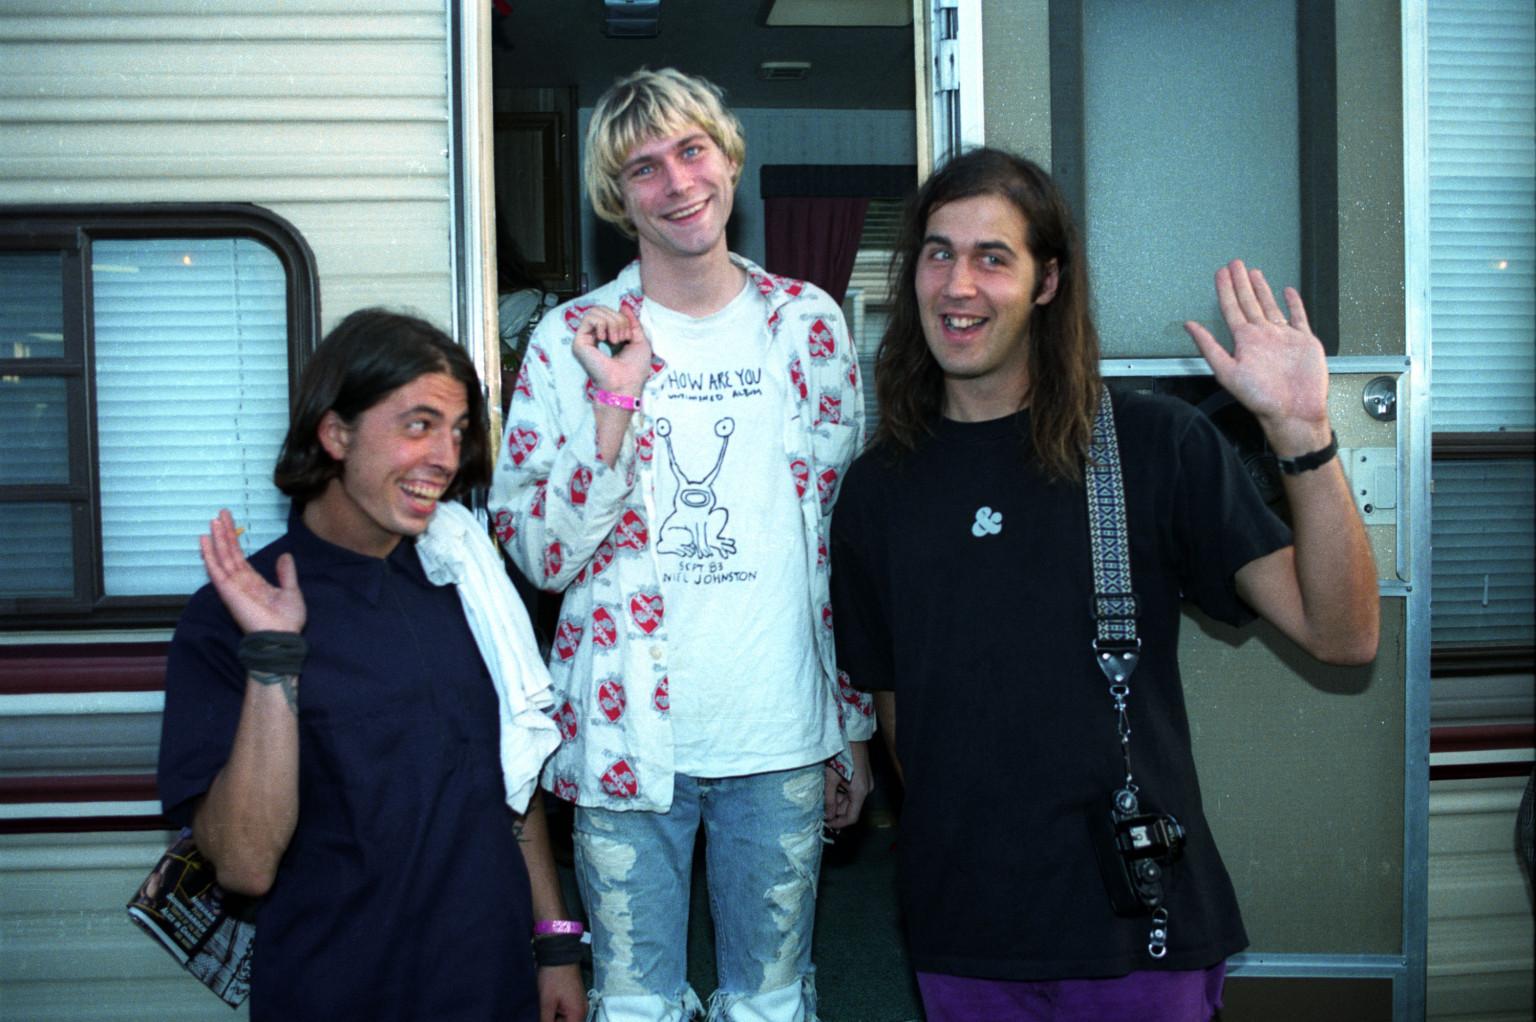 Dave Grohl,Kurt Cobain and Kirst Novoselic of Nirvana (Photo by Jeff Kravitz/FilmMagic)